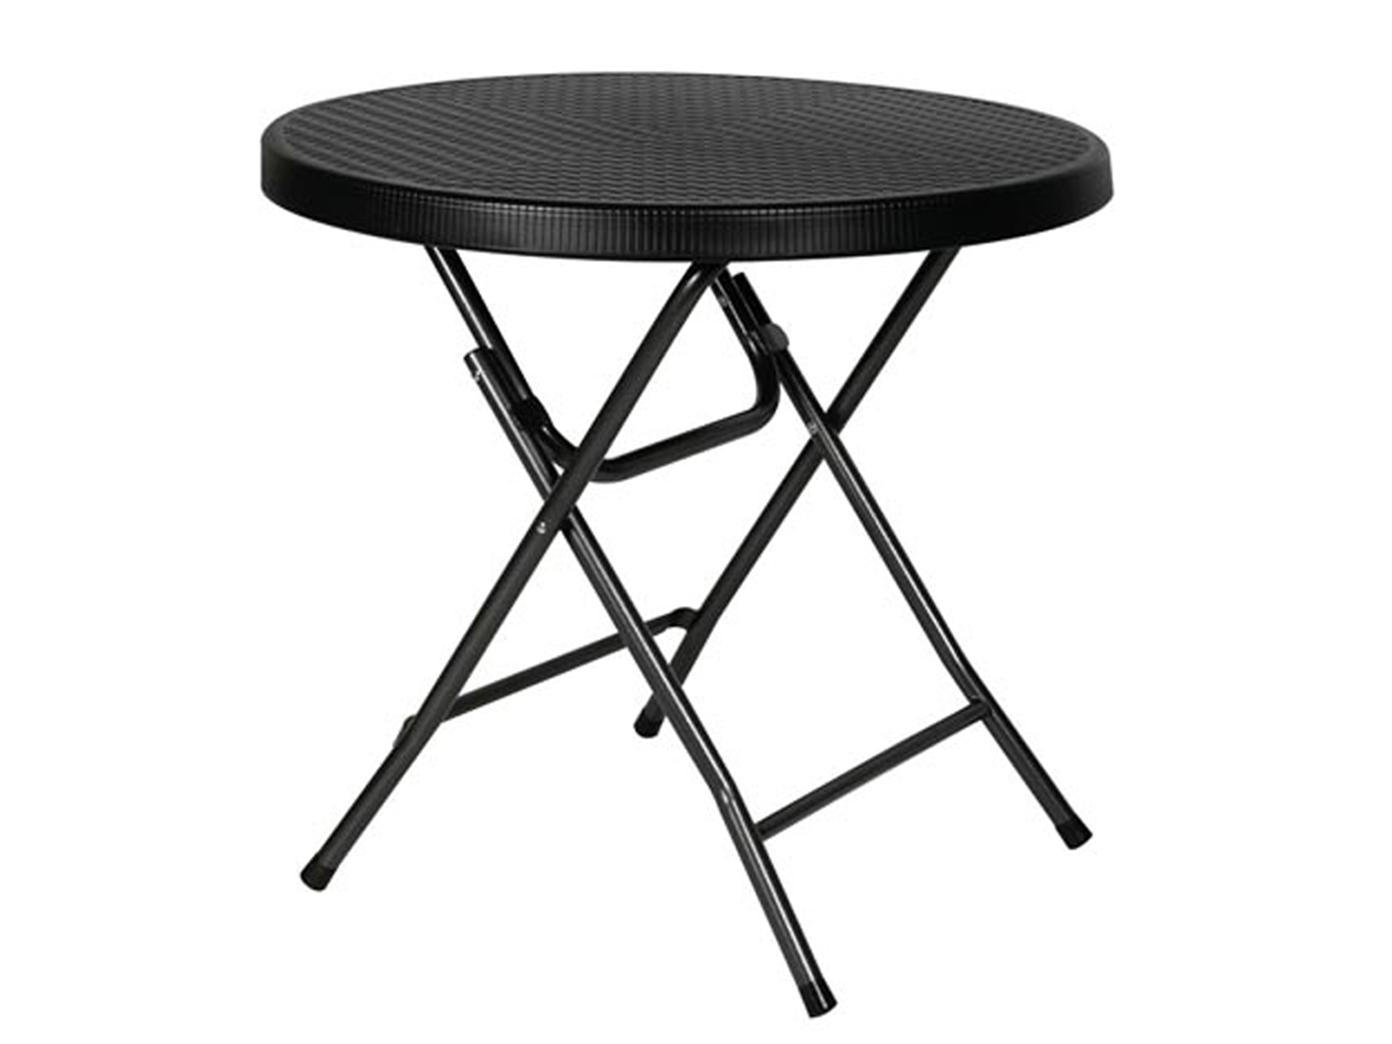 sitzgarnitur schwarz kunststoff stahl klappbar wetterfest gartengarnitur eur 128 99. Black Bedroom Furniture Sets. Home Design Ideas